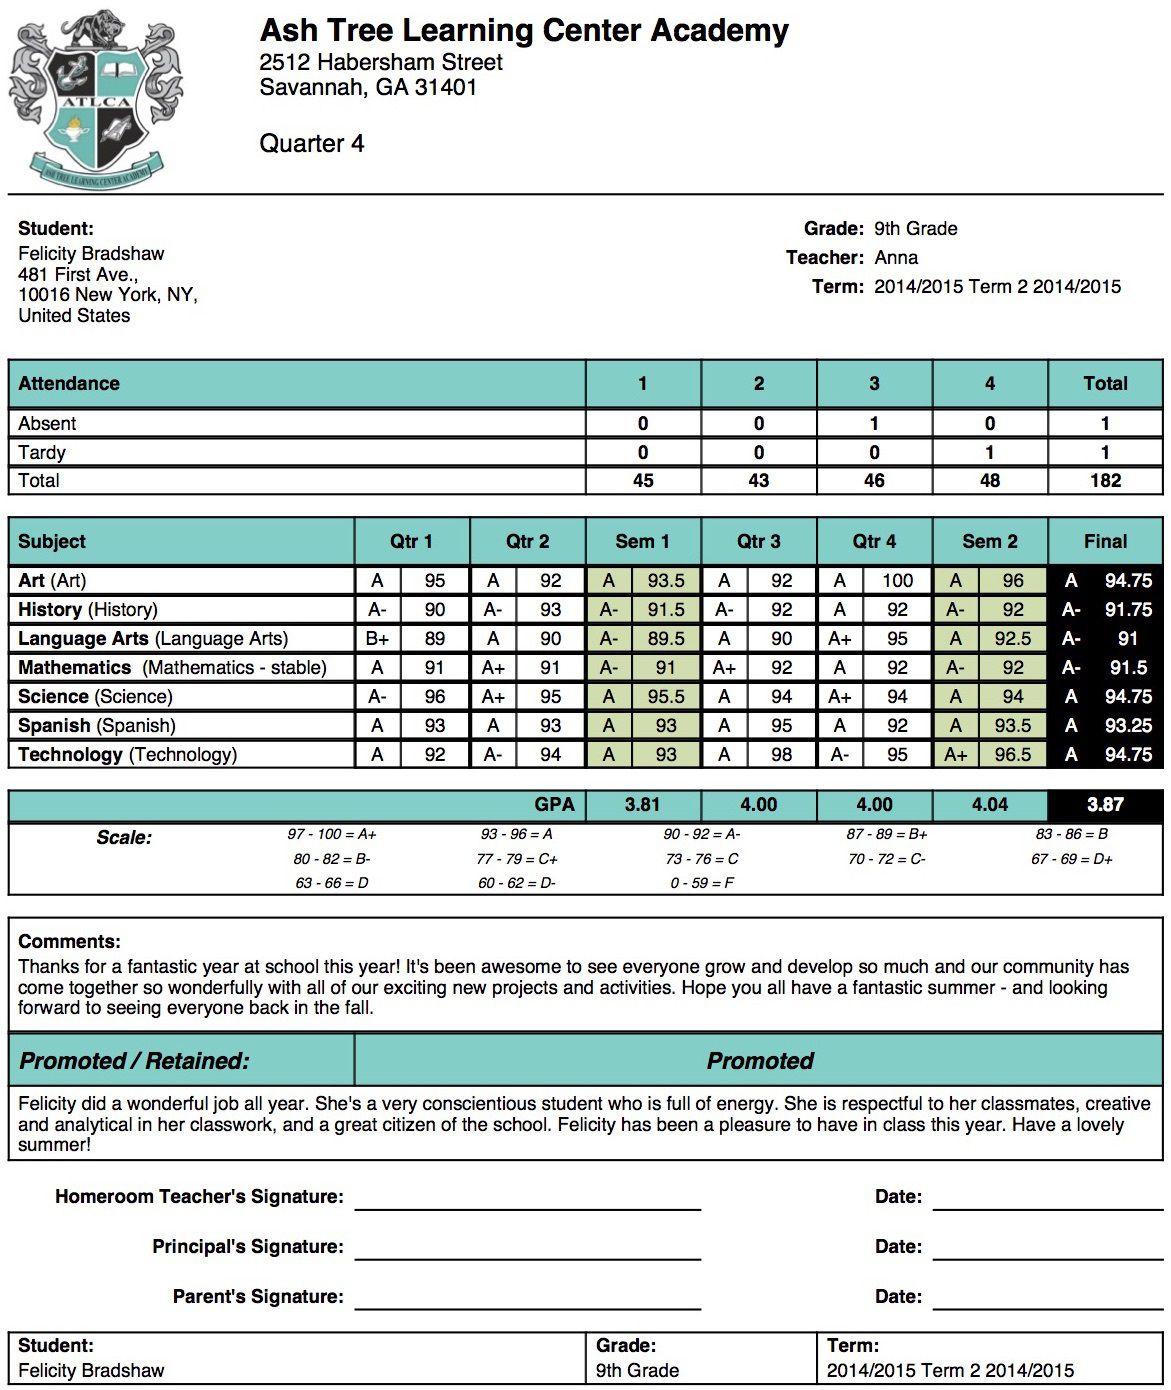 004 Astounding Middle School Report Card Template High Definition  Pdf Homeschool Free Standard Based SampleFull